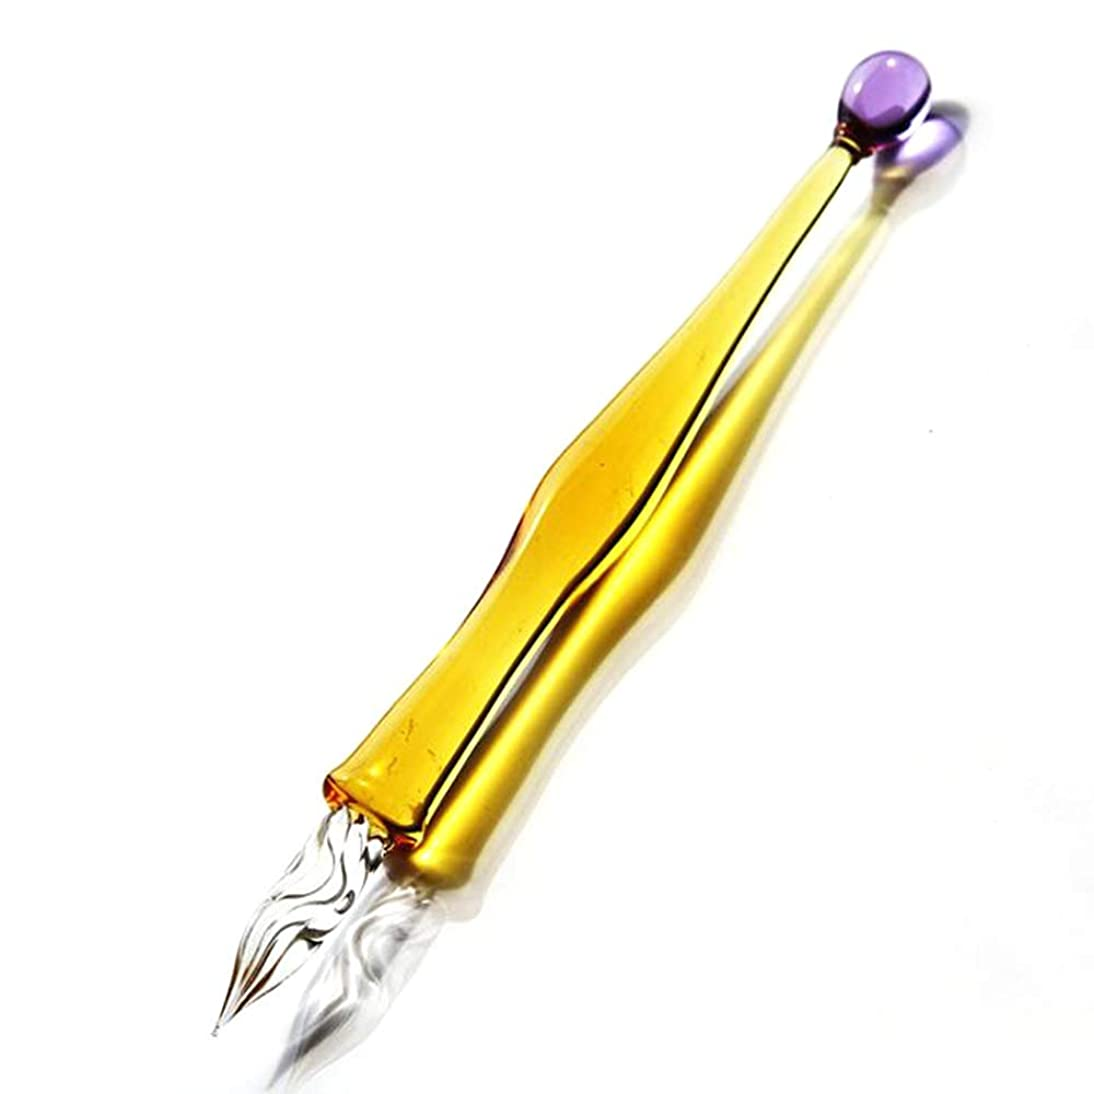 Yummy Bun Elegant Handmade Yellow Crystal Glass Dip Pen Calligraphy Retro Signature Pen